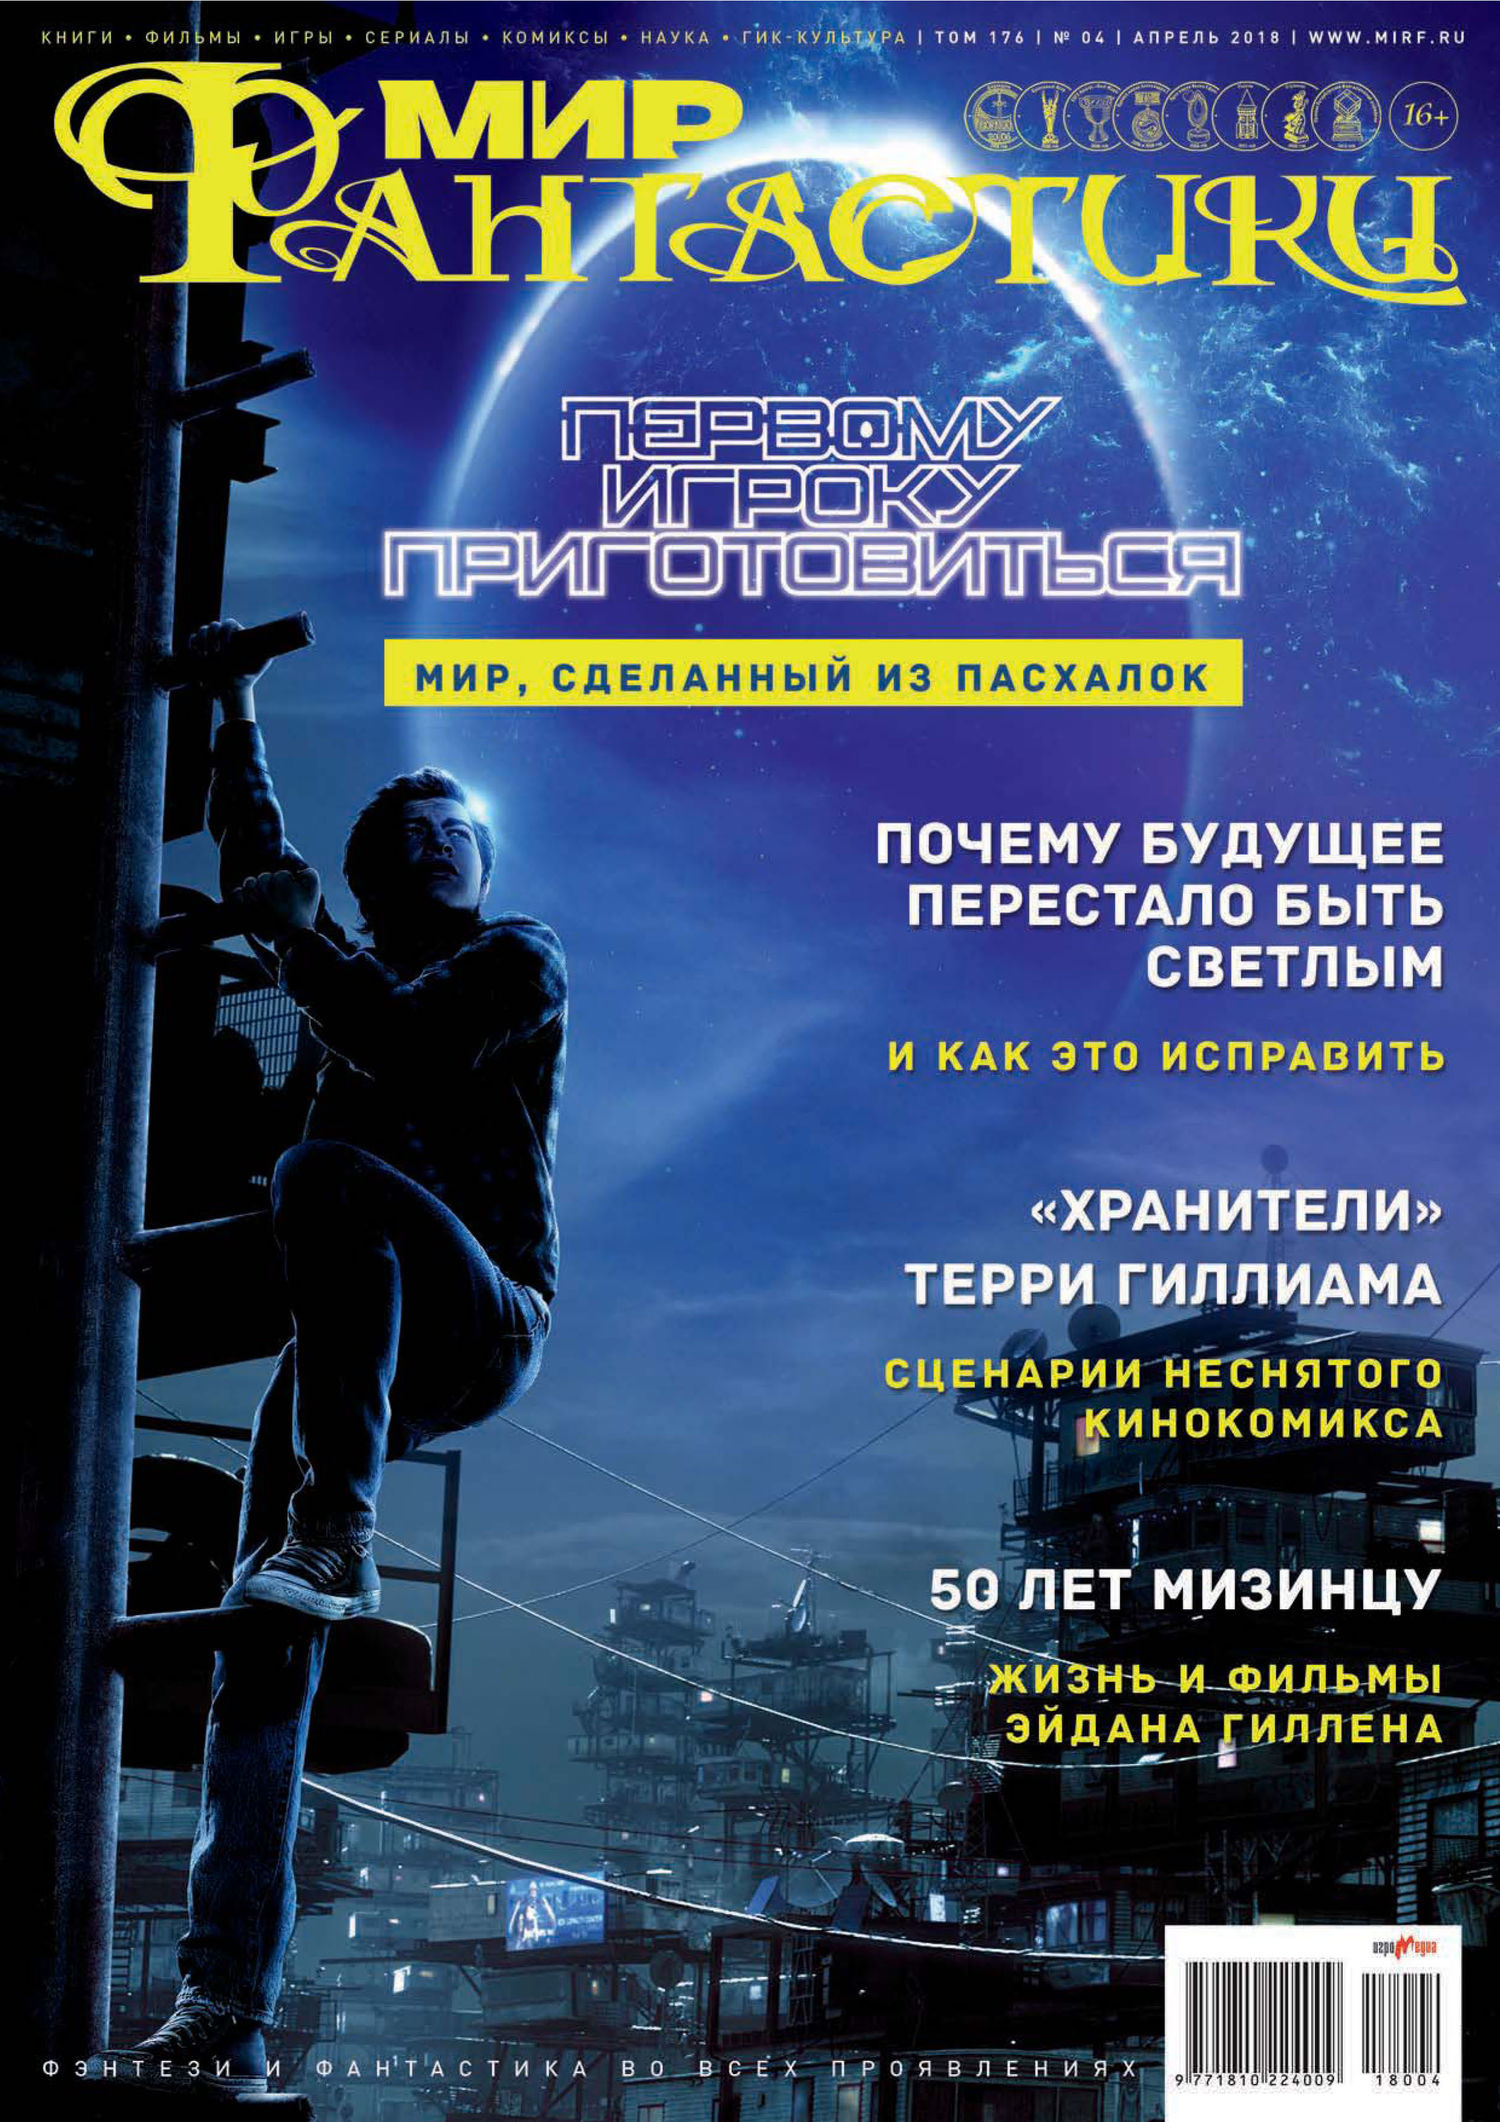 mirf.ru. Мир фантастики №04/2018